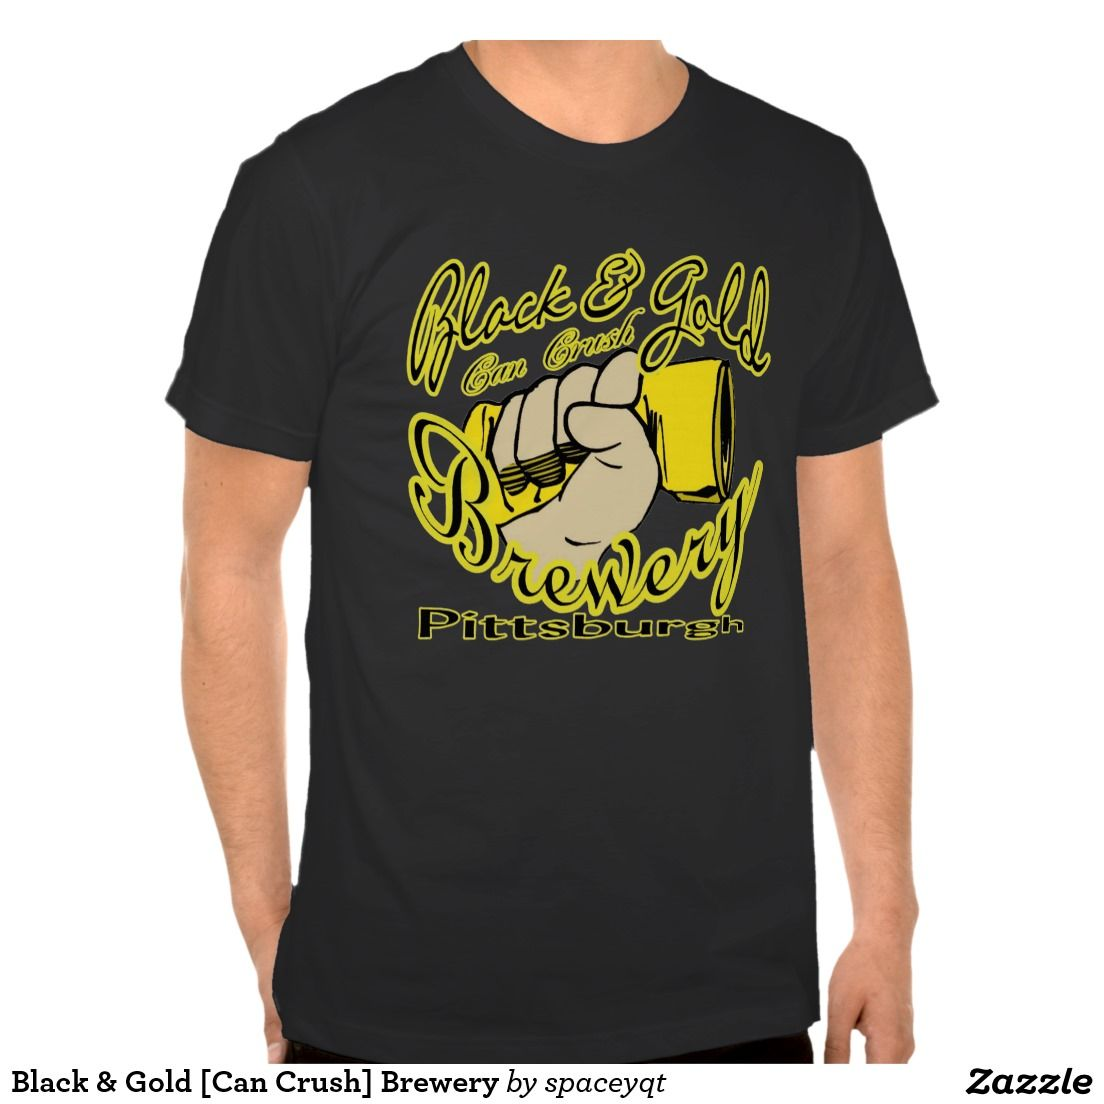 Black & Gold [Can Crush] Brewery T Shirts